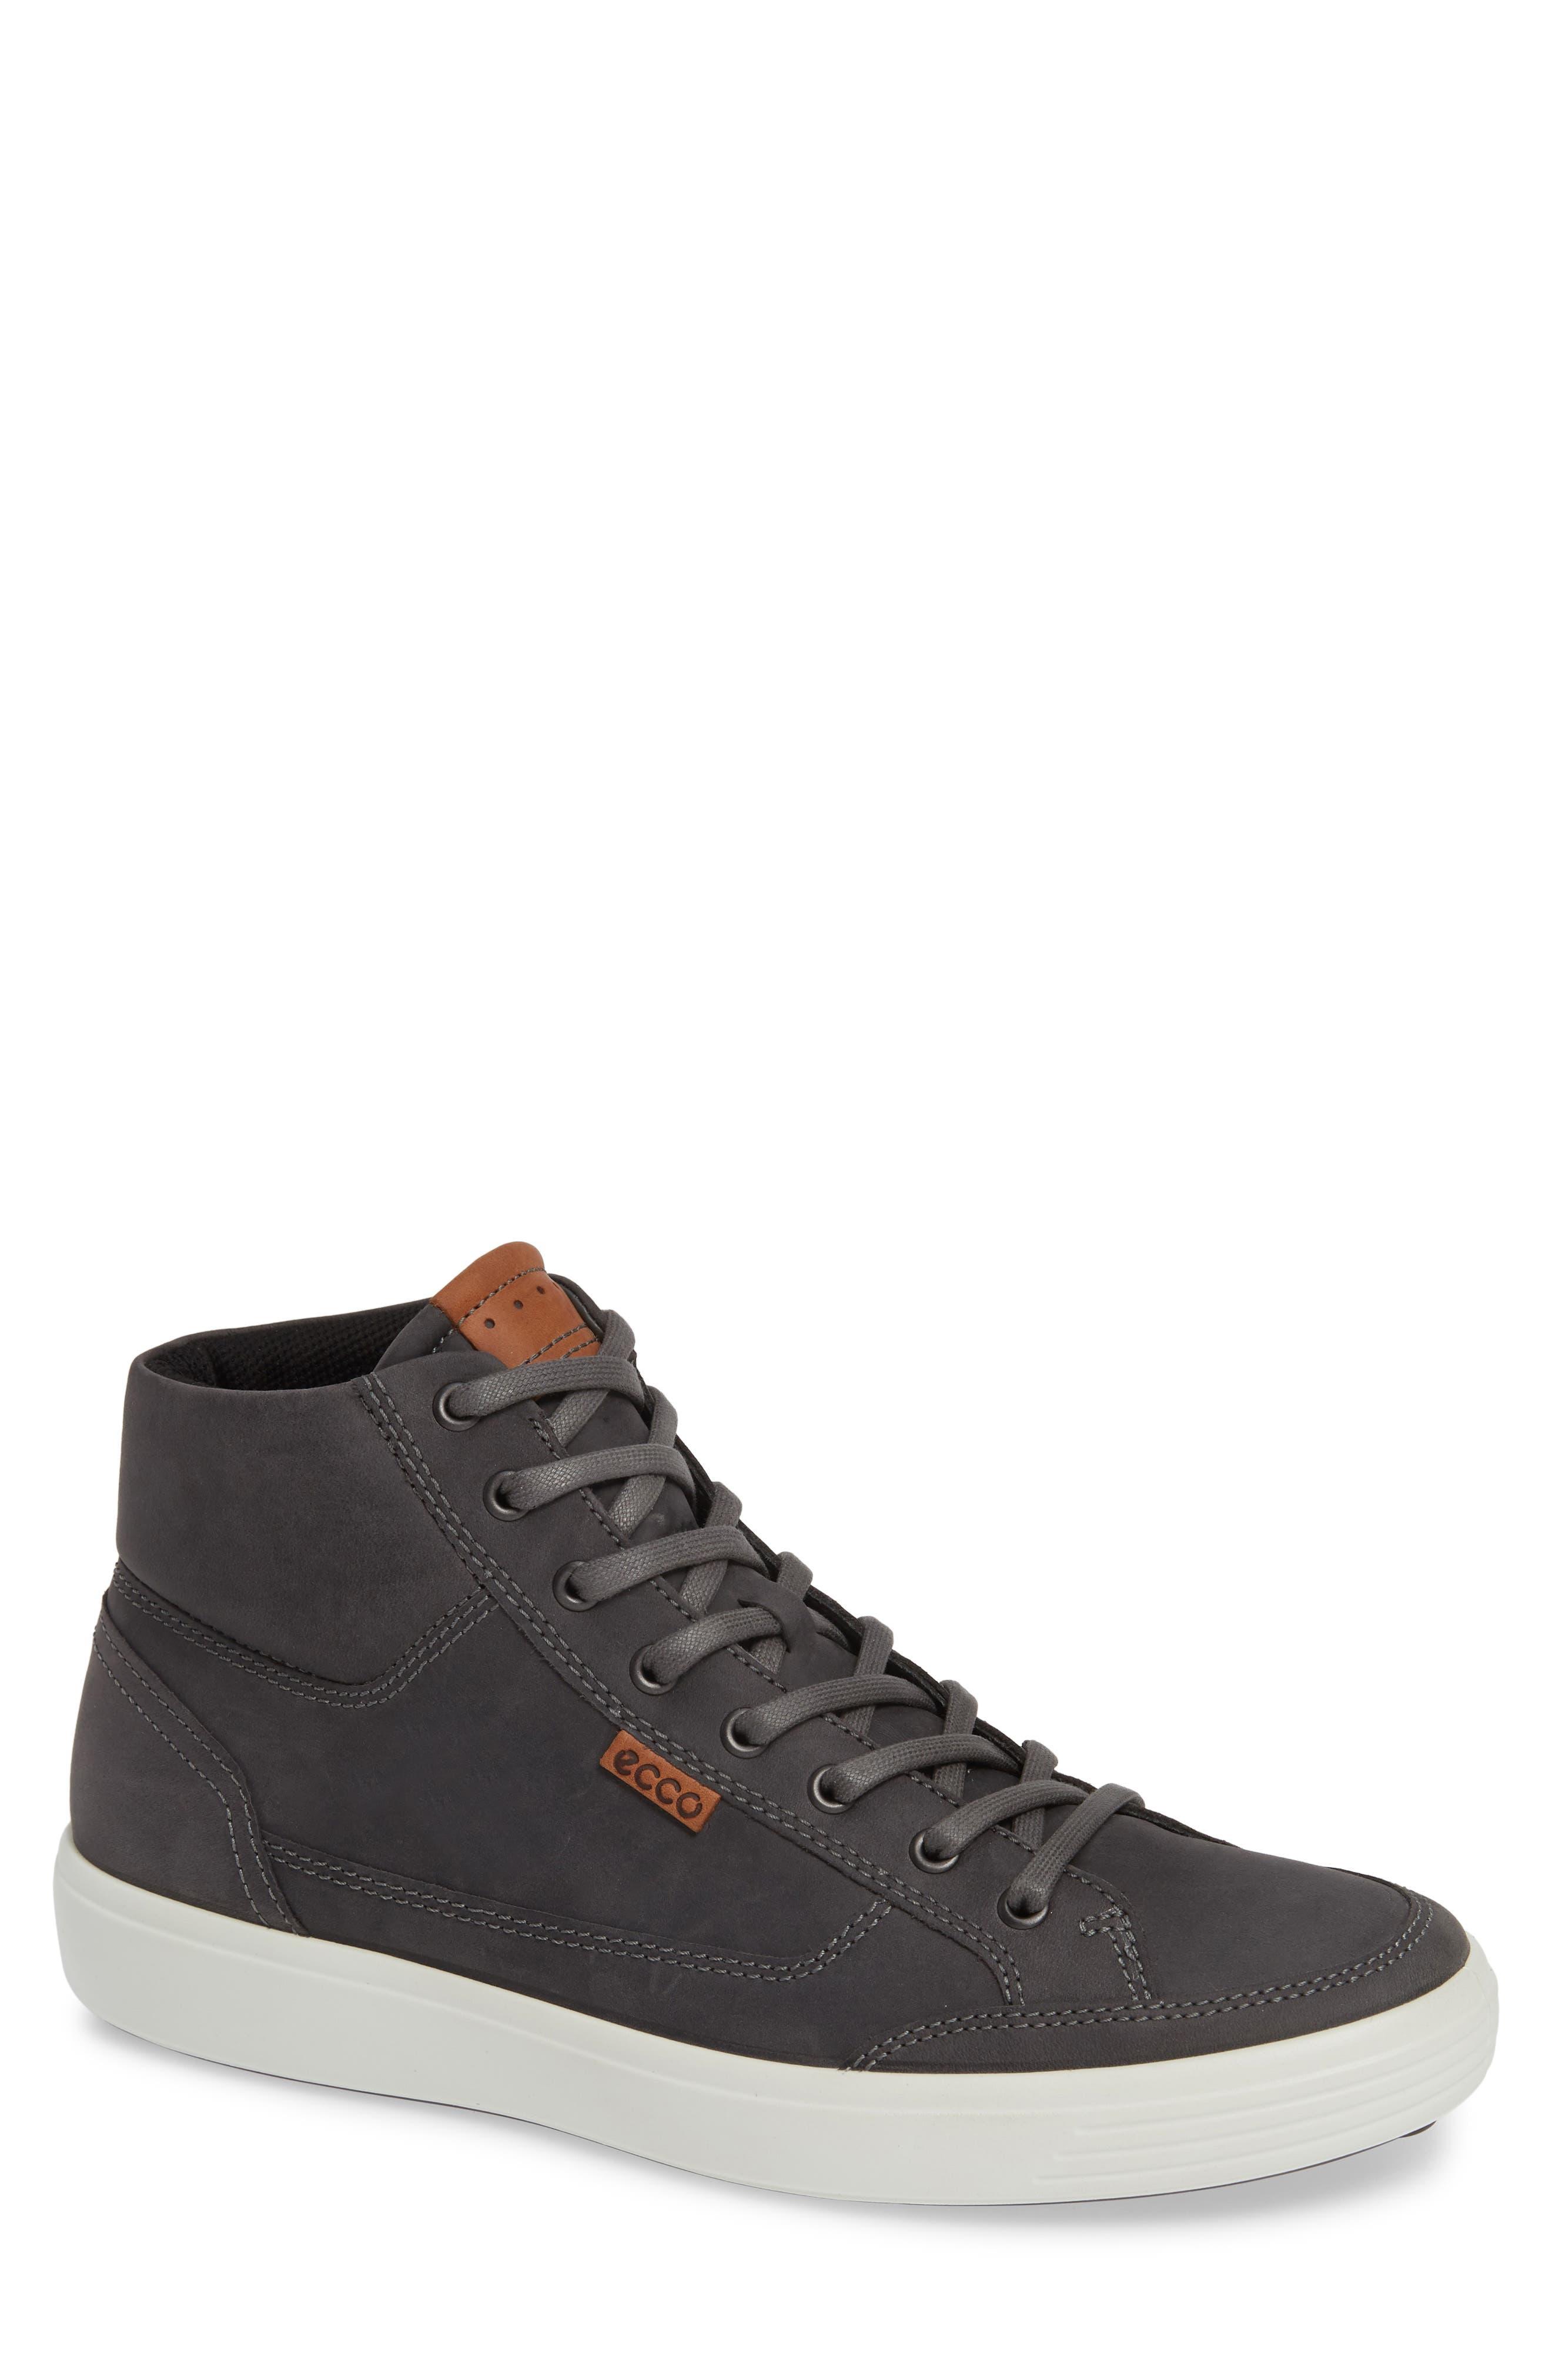 Soft 7 Sneaker,                         Main,                         color, TITANIUM LEATHER